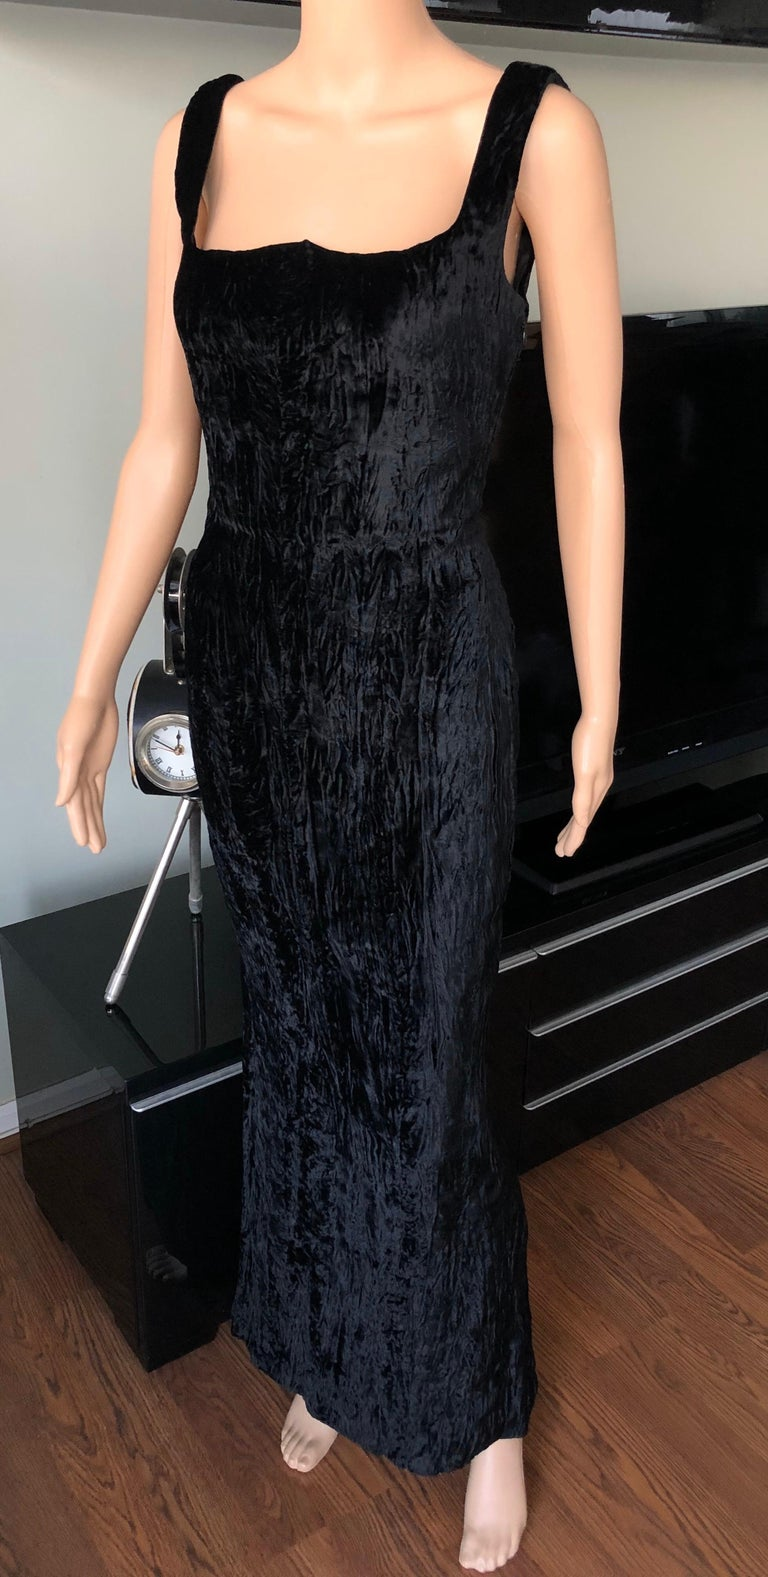 Women's Gianni Versace F/W 1995 Runway Vintage Velvet Black Maxi Dress Gown